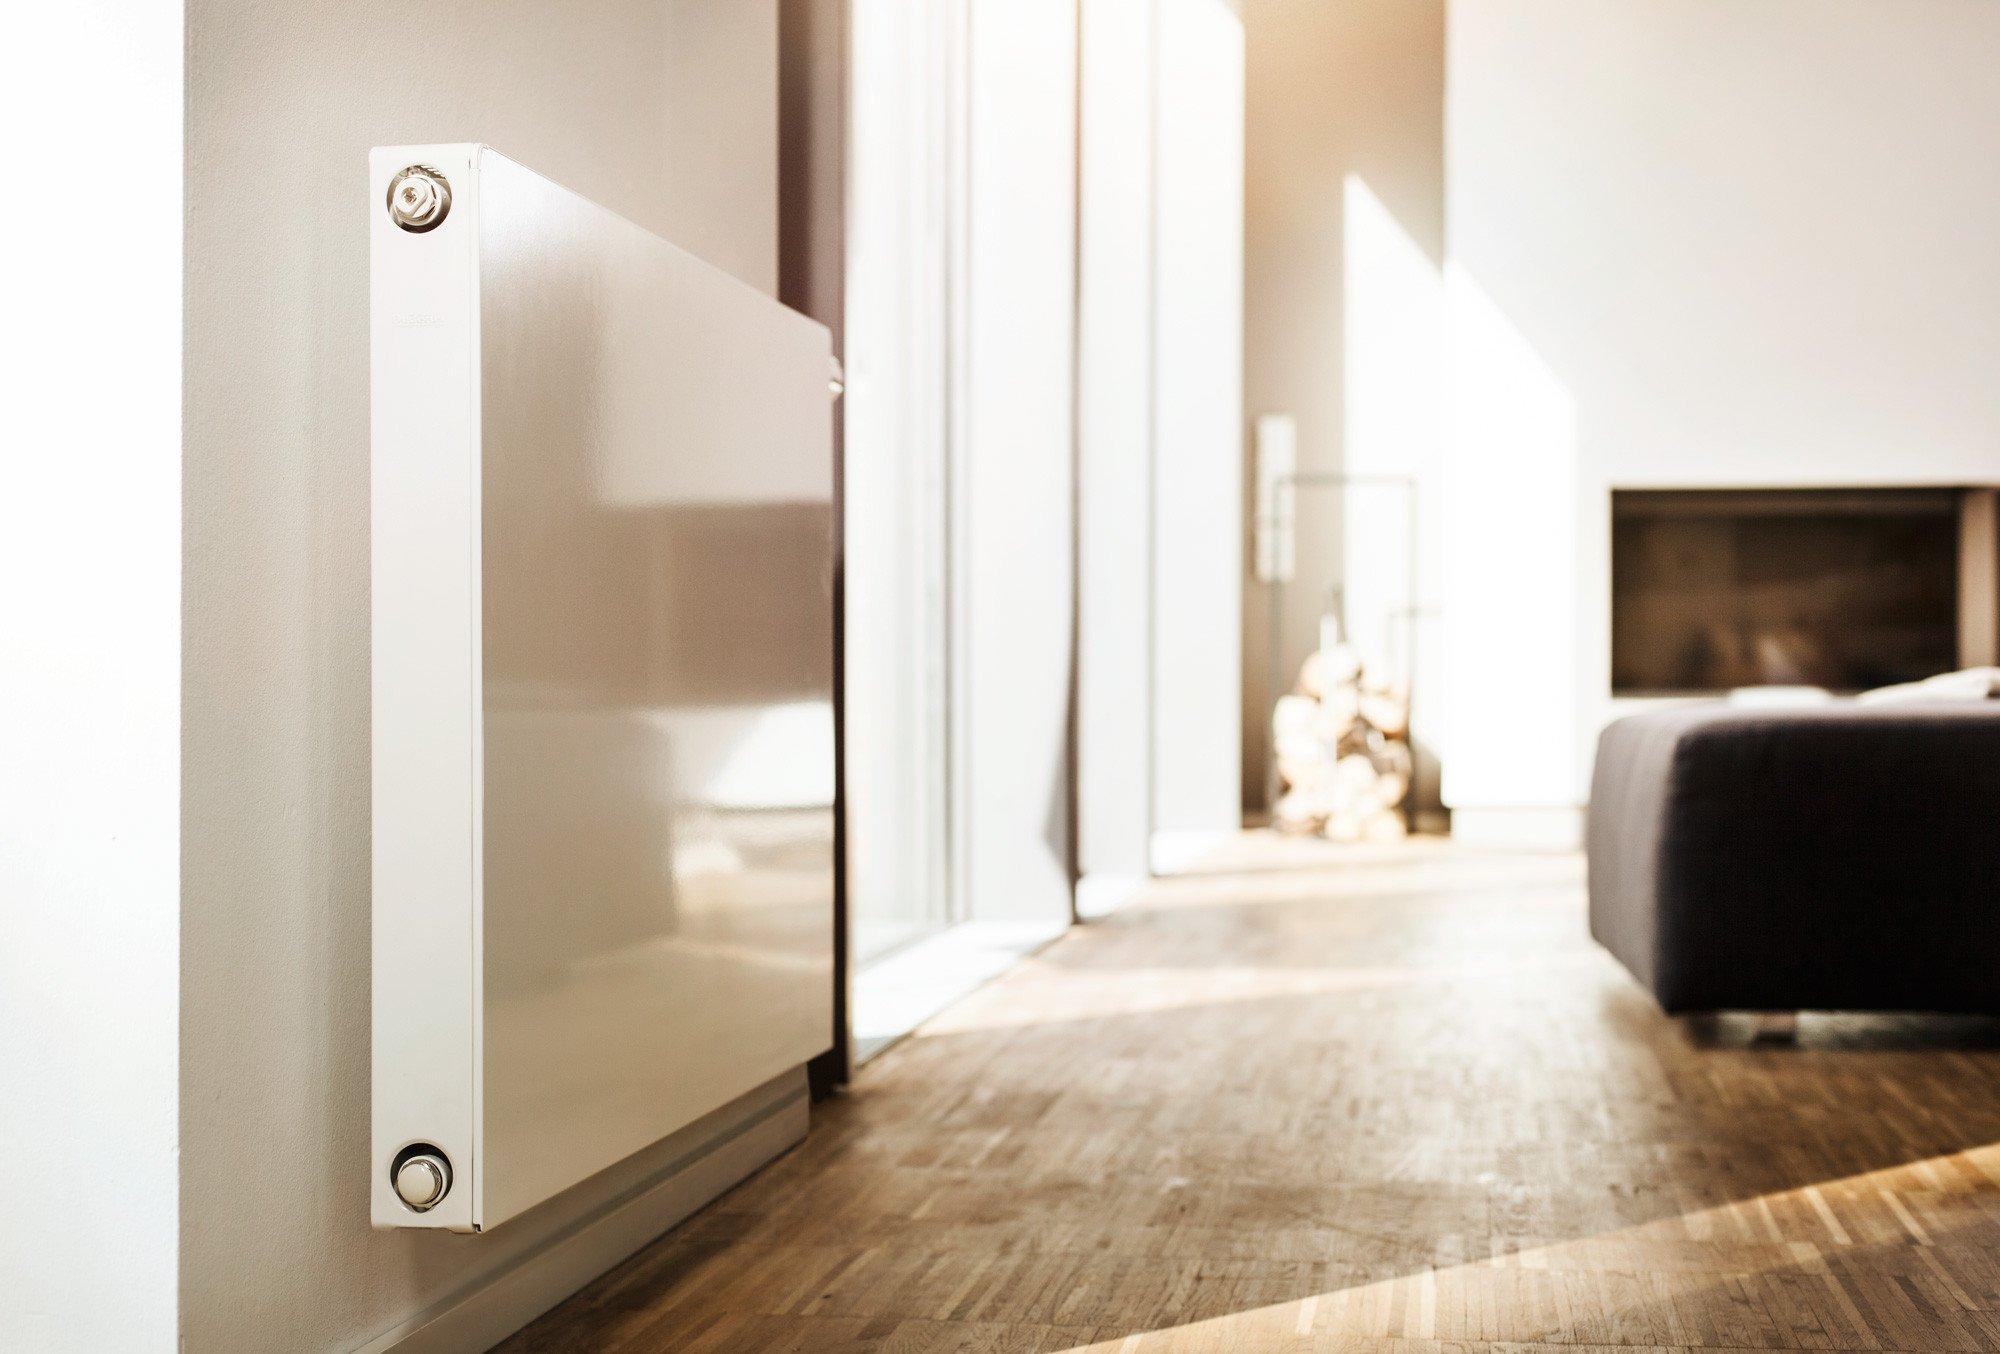 Full Size of Plattenheizkrper Heizkörper Badezimmer Bett Flach Für Bad Flachdach Fenster Elektroheizkörper Wohnzimmer Wohnzimmer Heizkörper Flach